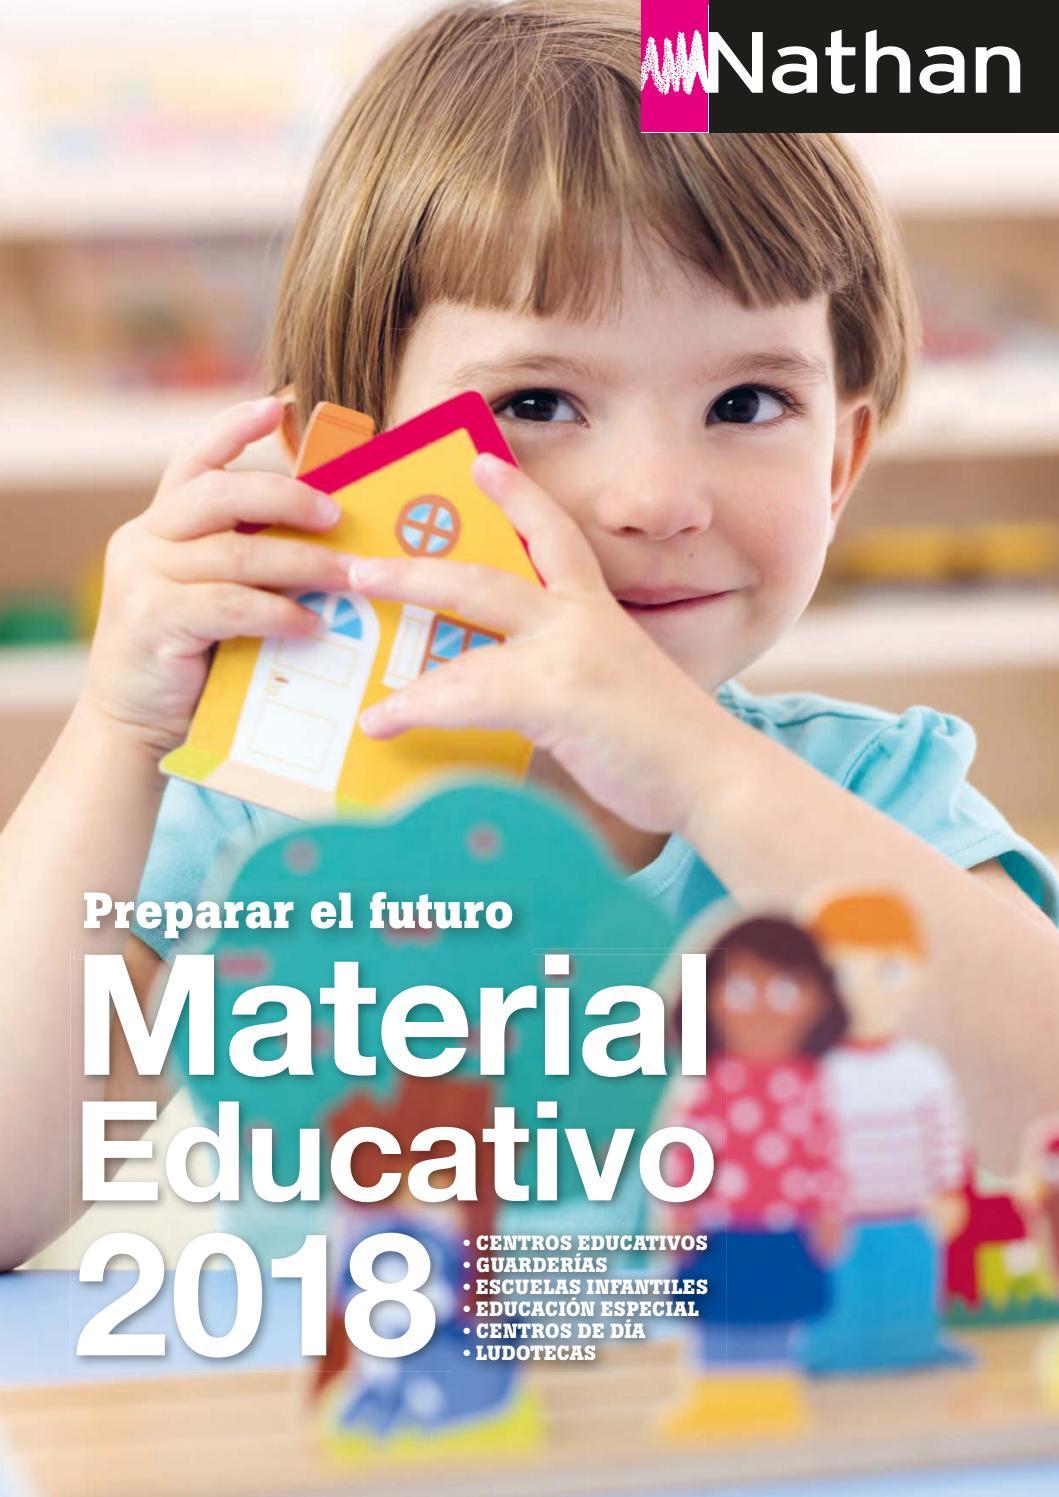 a8ed33b1317 Catálogo Nathan 2018 by Azarbe Educativos - issuu